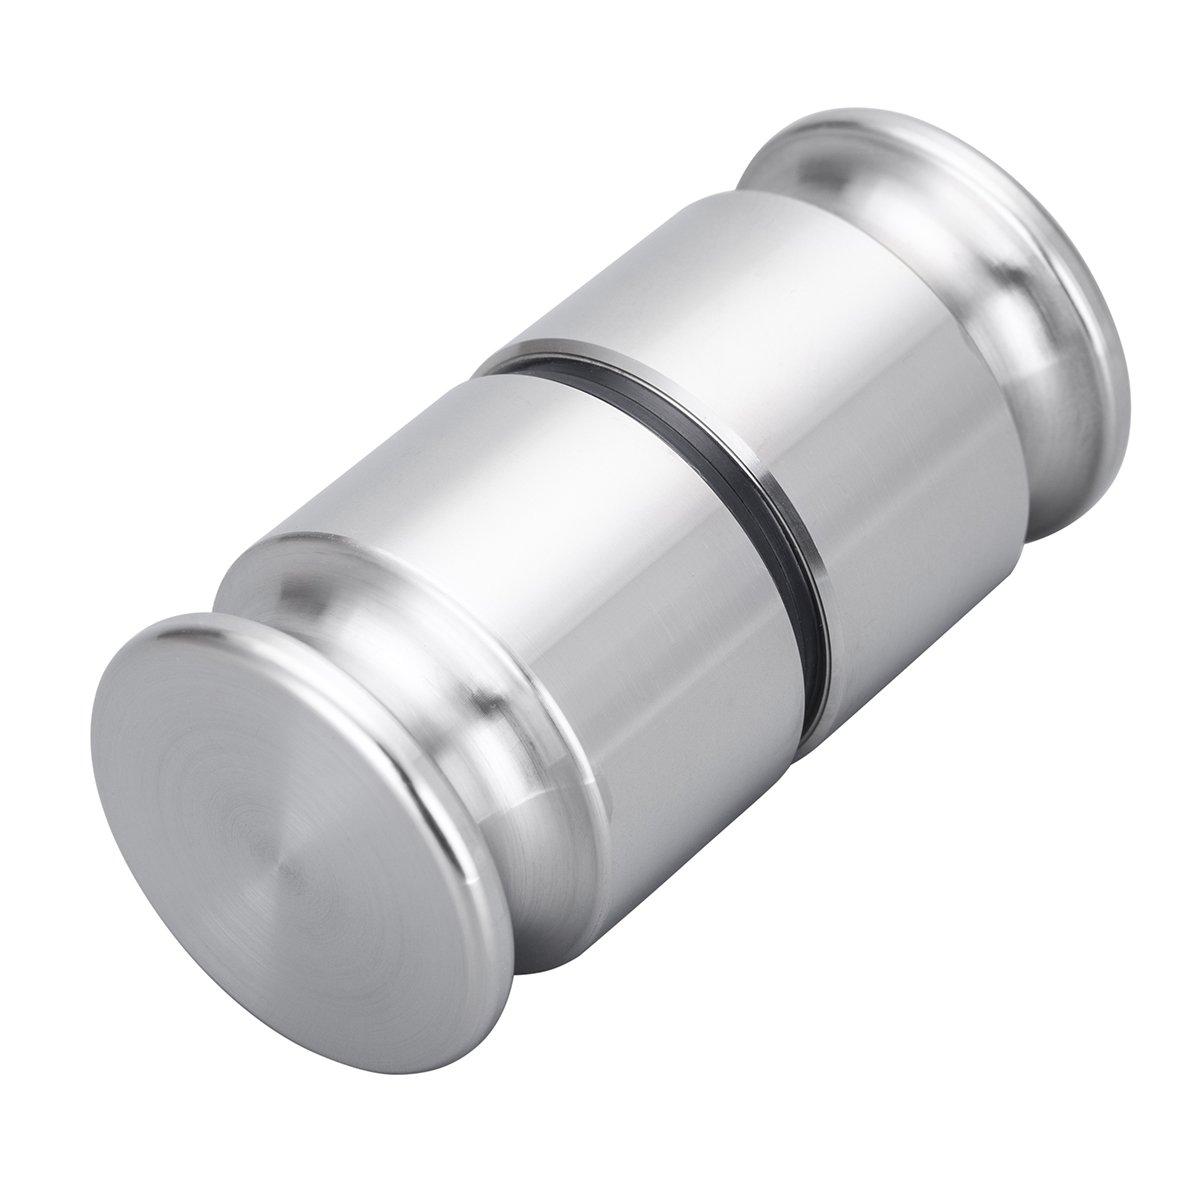 Solid stainless steel Shower Door Pair Handle Knob, Door handle knob, Groove Shower Door Handle knobs, handles knobs for bathroom DIYI